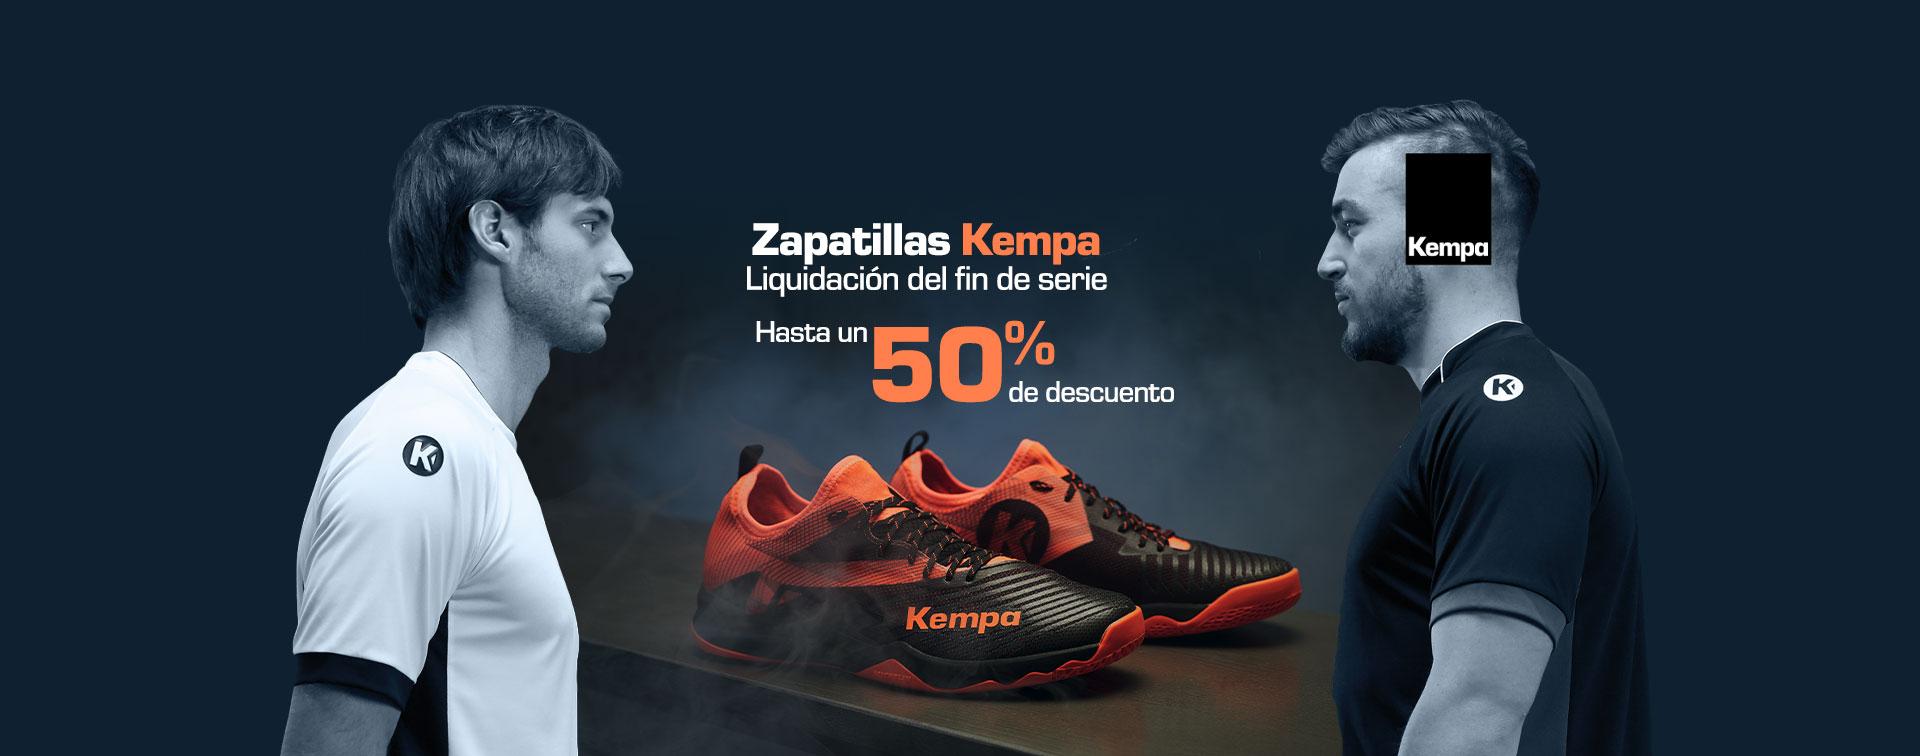 kempa zapatillas